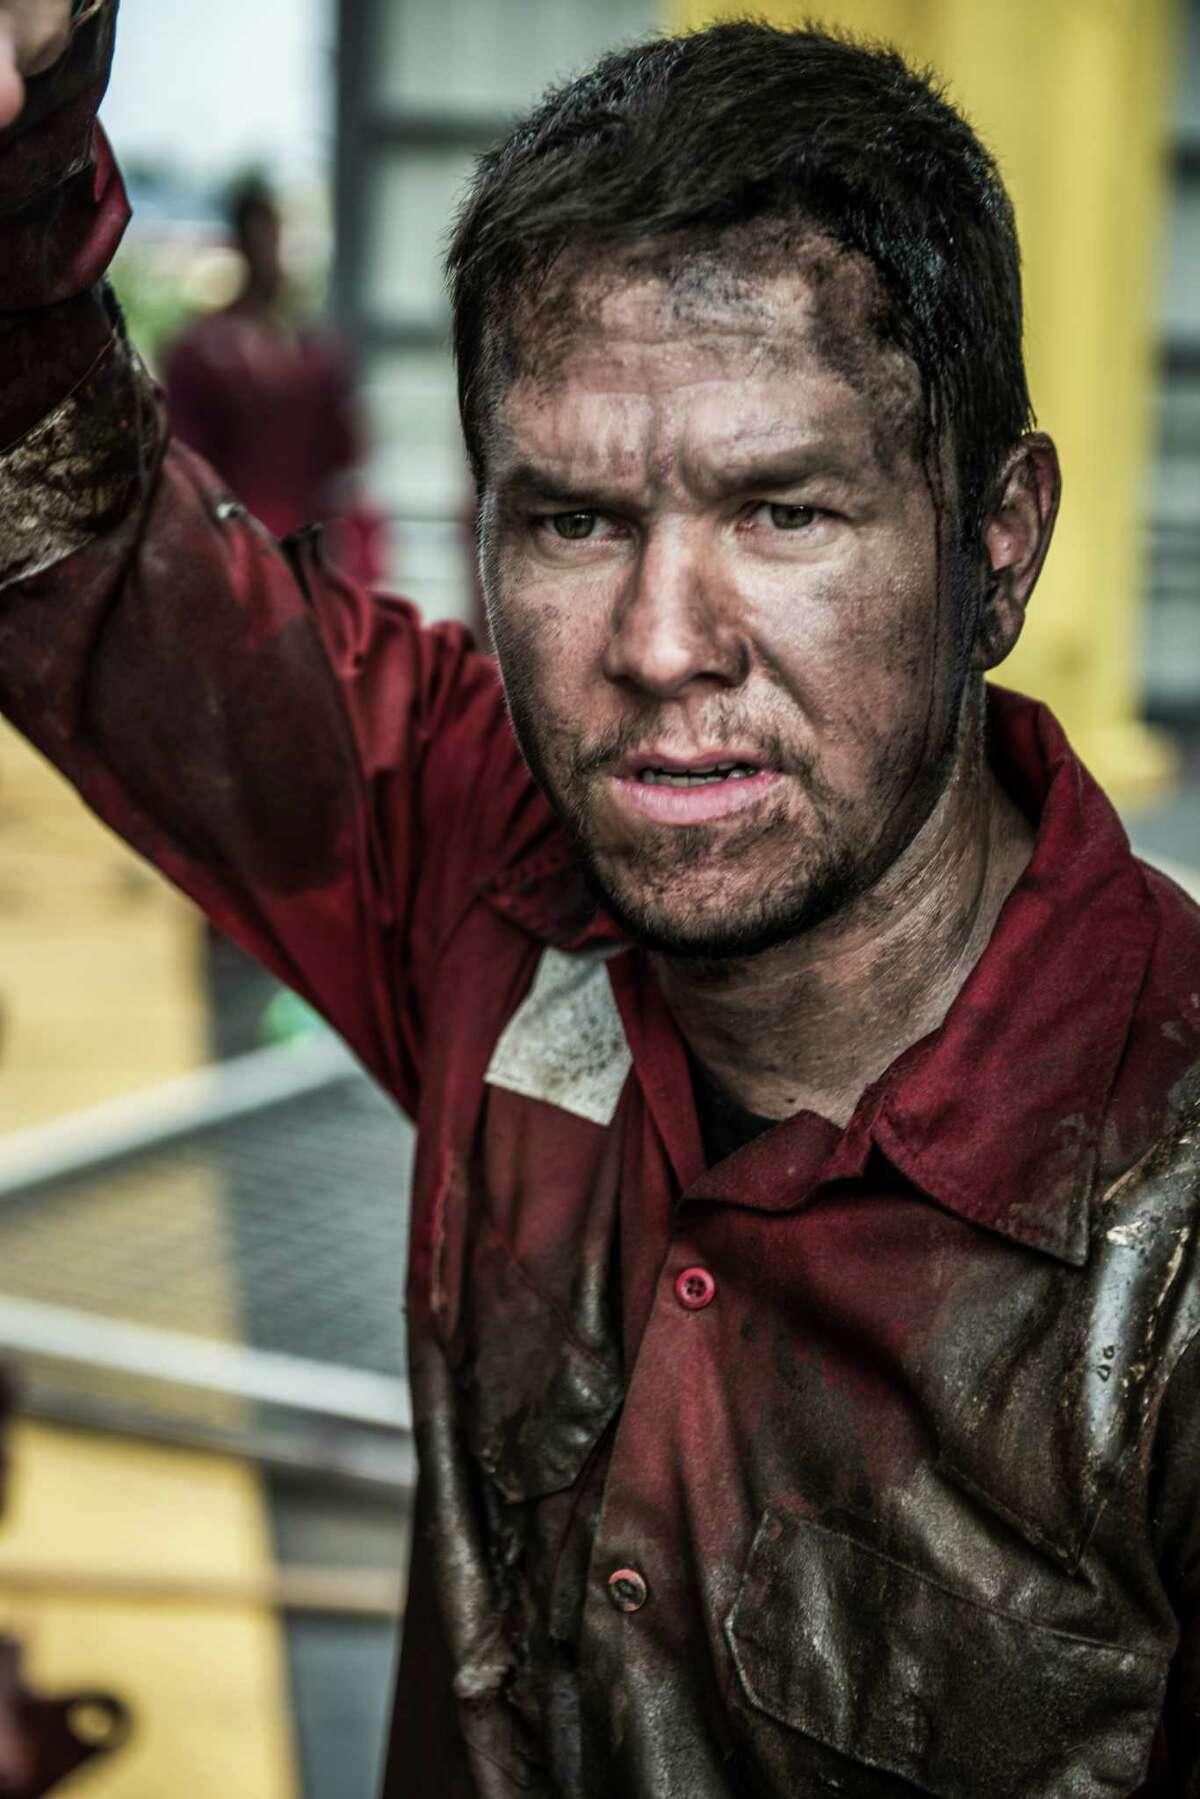 Wahlberg as oil rig worker Mike Williams.